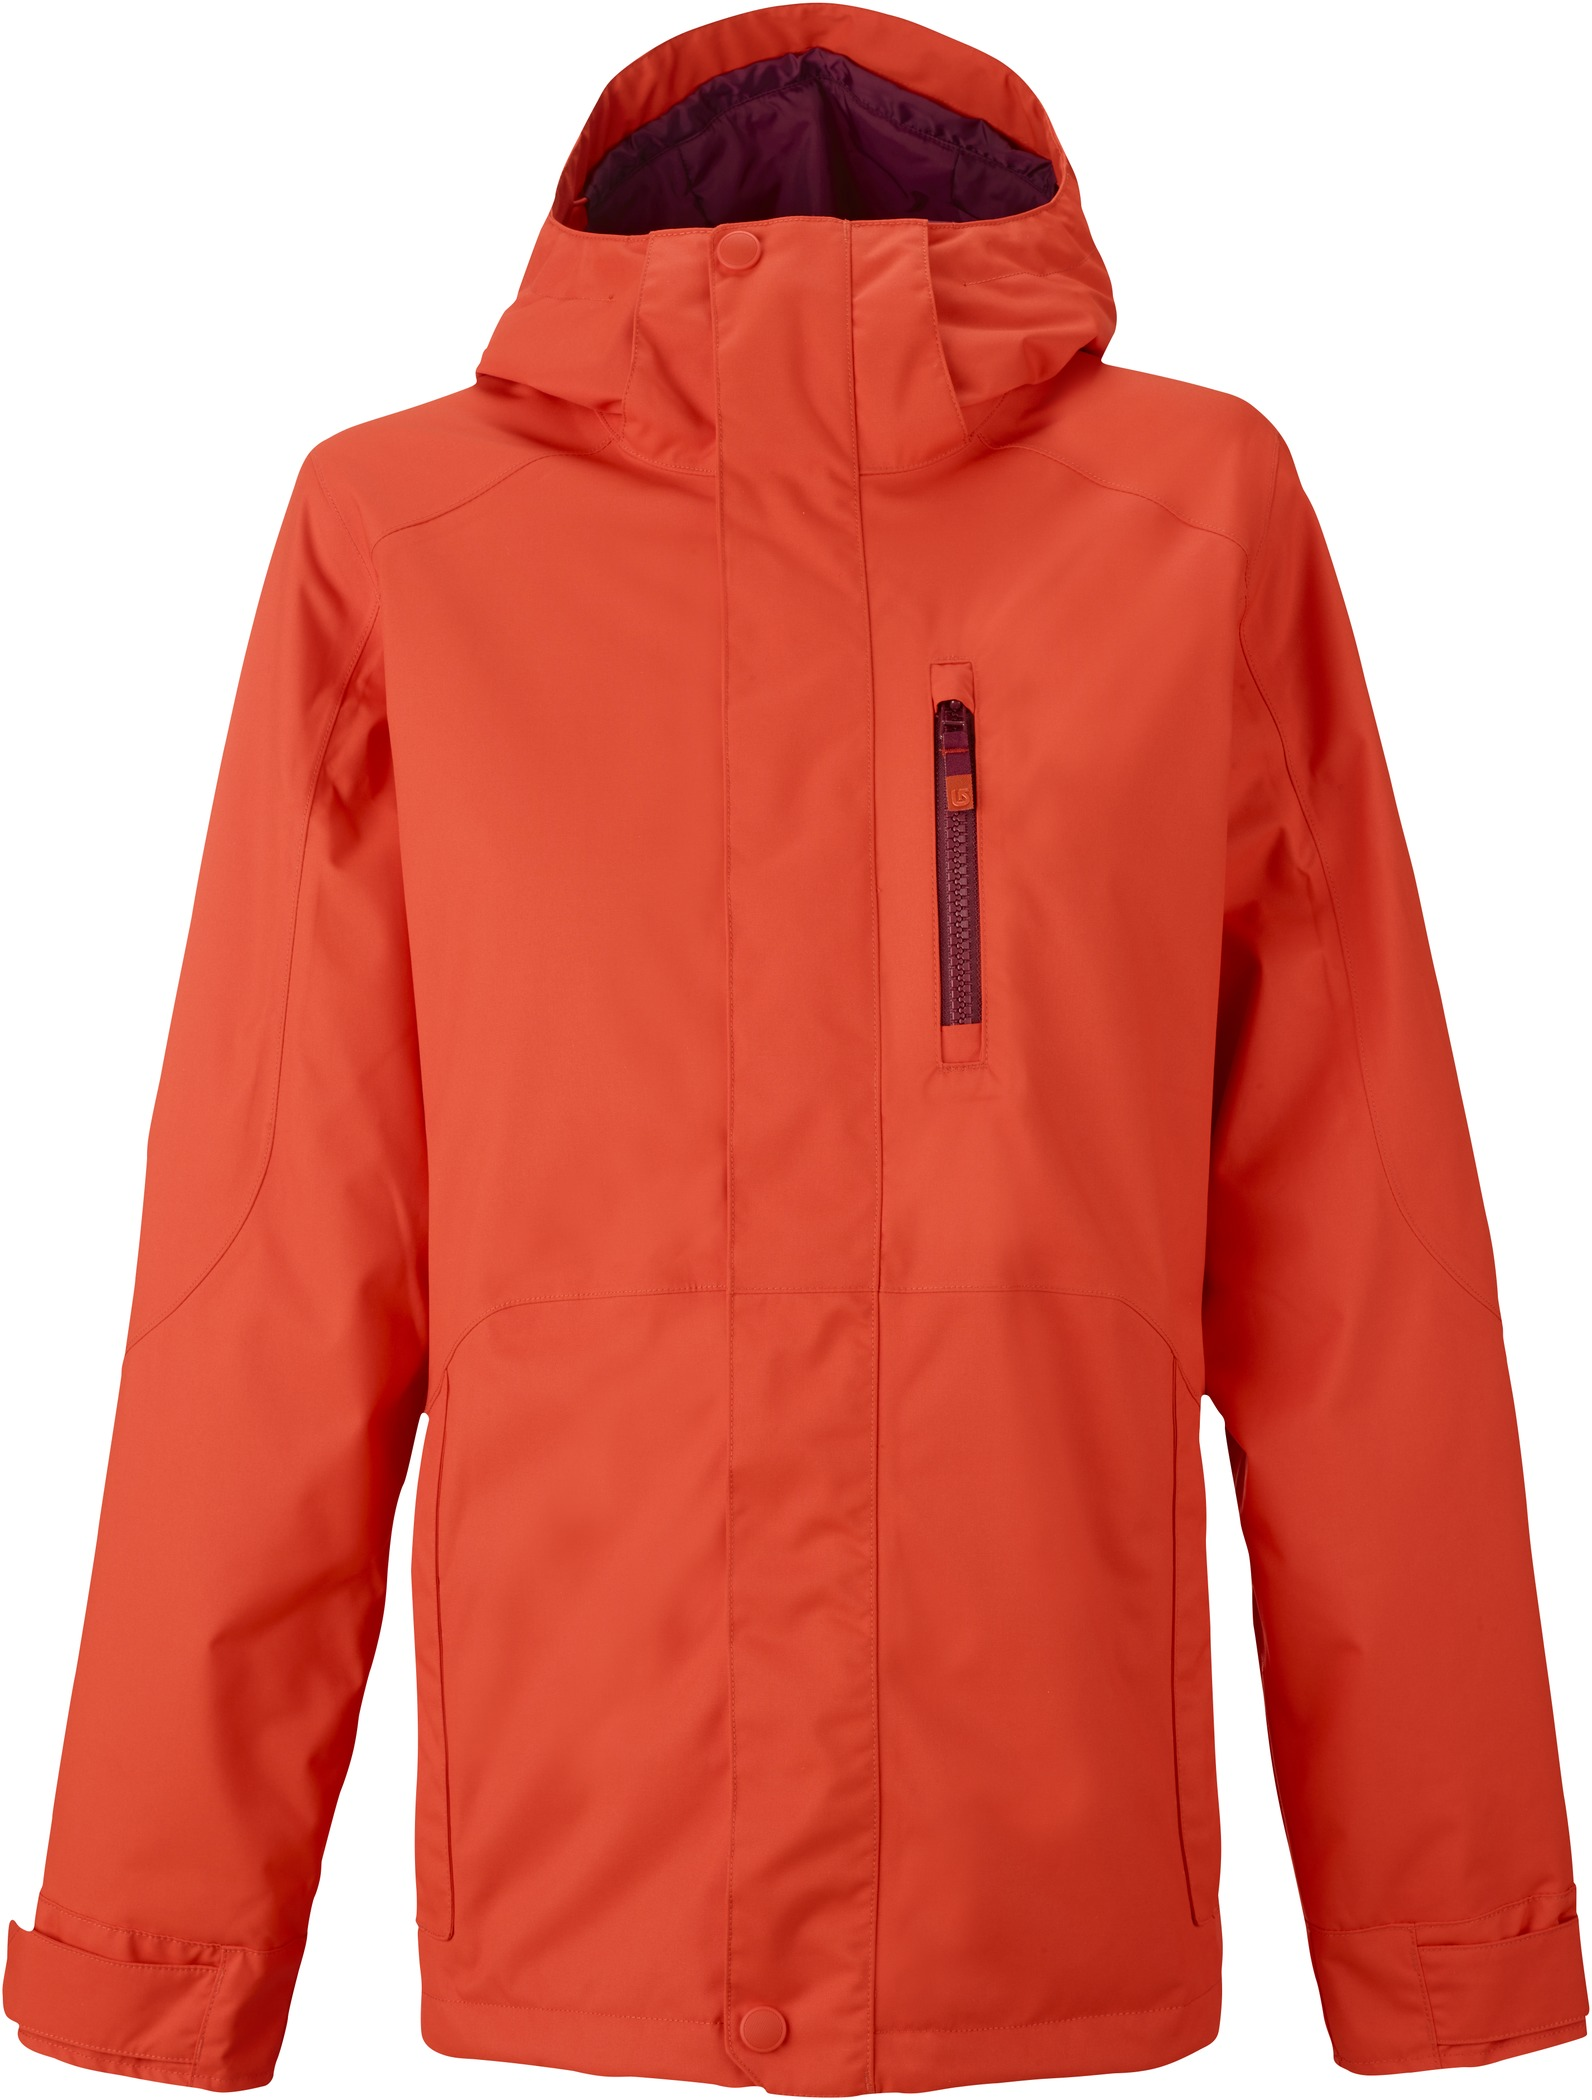 Kurtka Damska Burton Horizon Jacket (Aries)